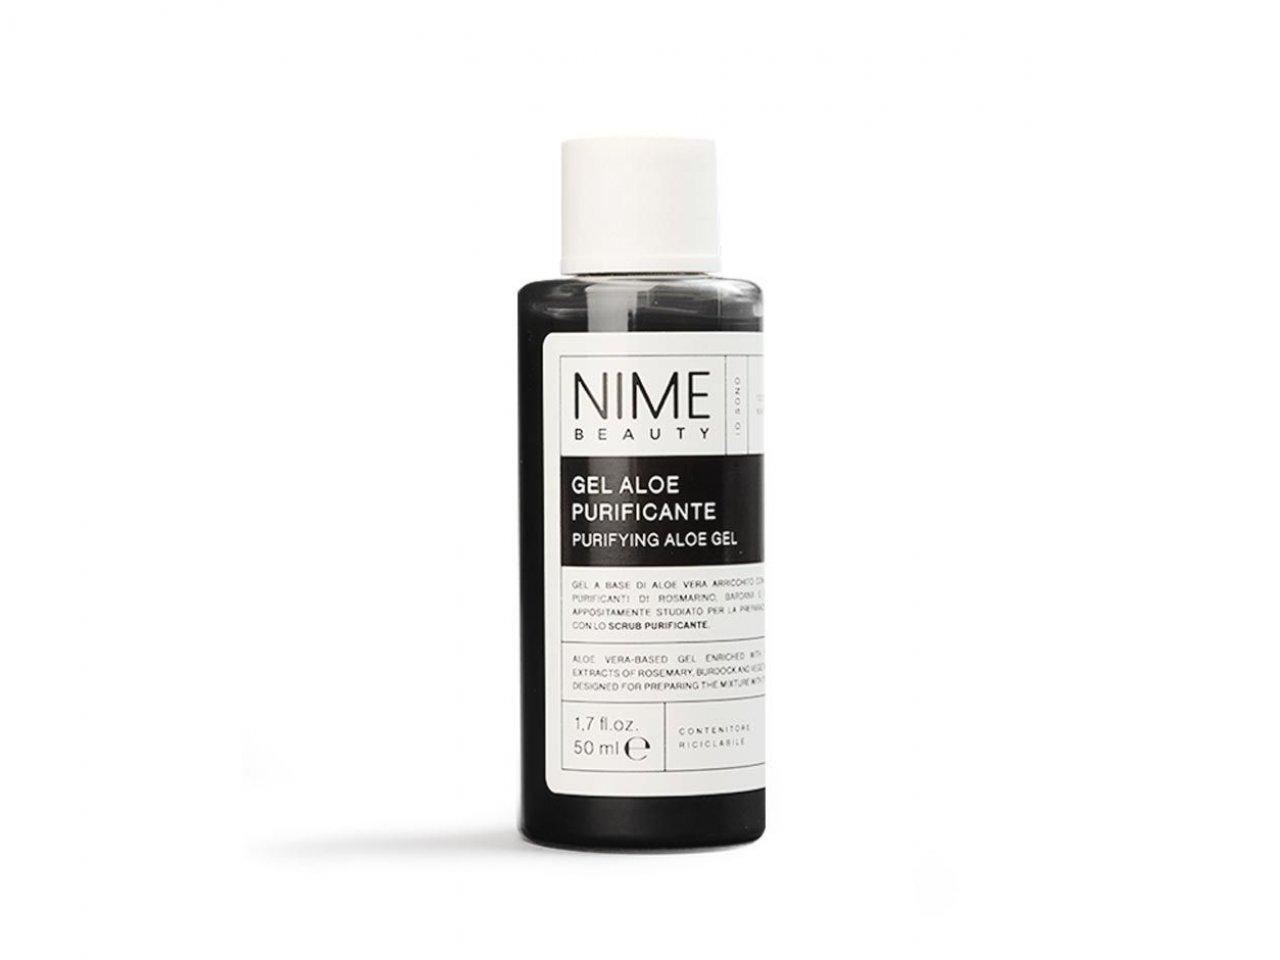 Maschera Viso Fai da Te Antiossidante + Gel Aloe Purificante - v3